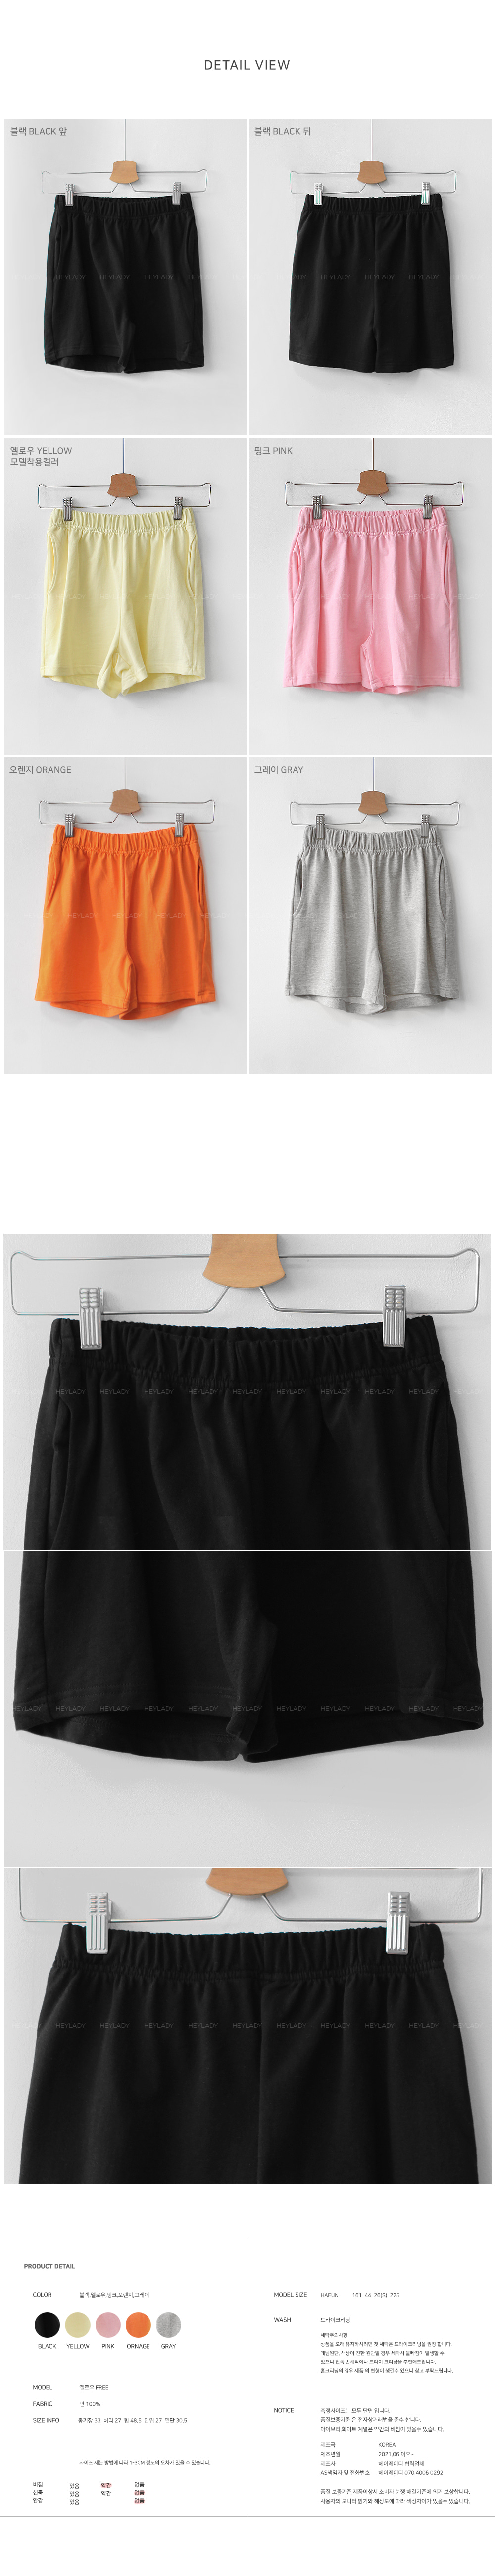 Key Rib Cotton Short Pants